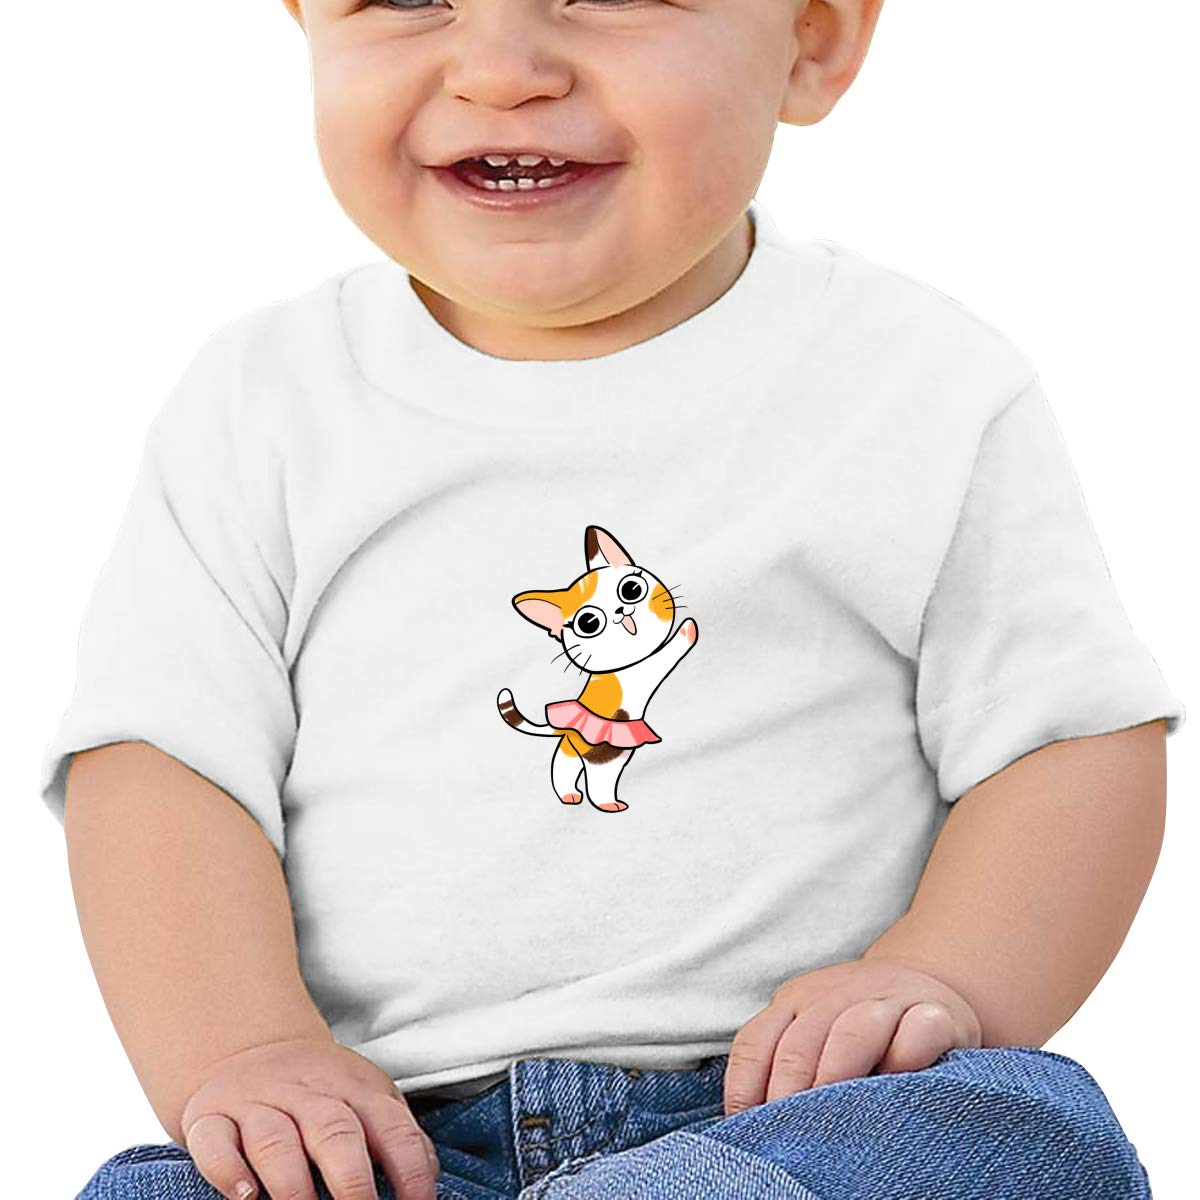 BuecoutesDance Cat Toddler//Infant Short Sleeve Cotton T Shirts White